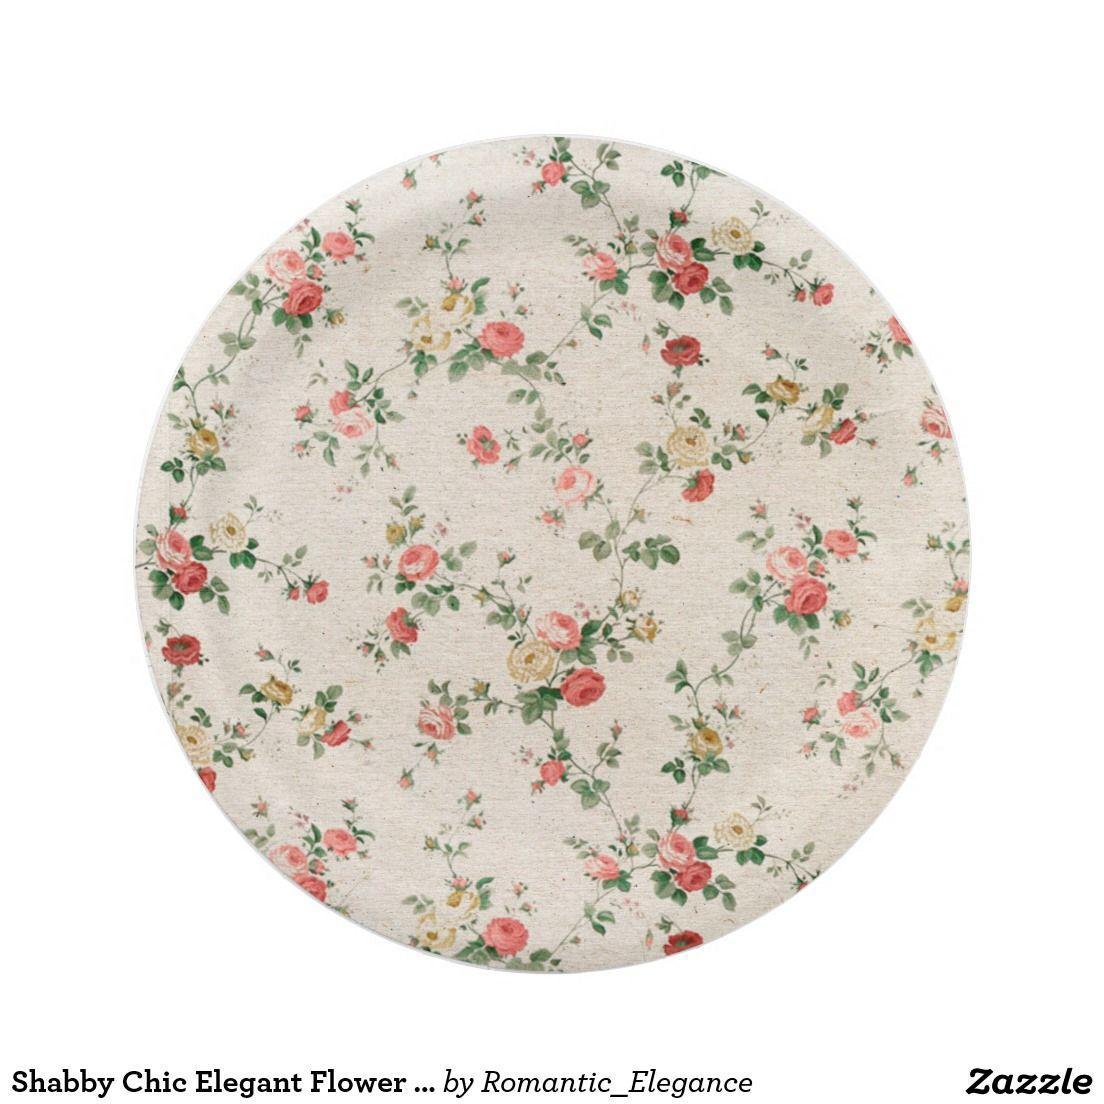 Shabby Chic Elegant Flower Floral Paper Plate  sc 1 st  Pinterest & Shabby Chic Elegant Flower Floral Paper Plate   Elegant flowers and ...